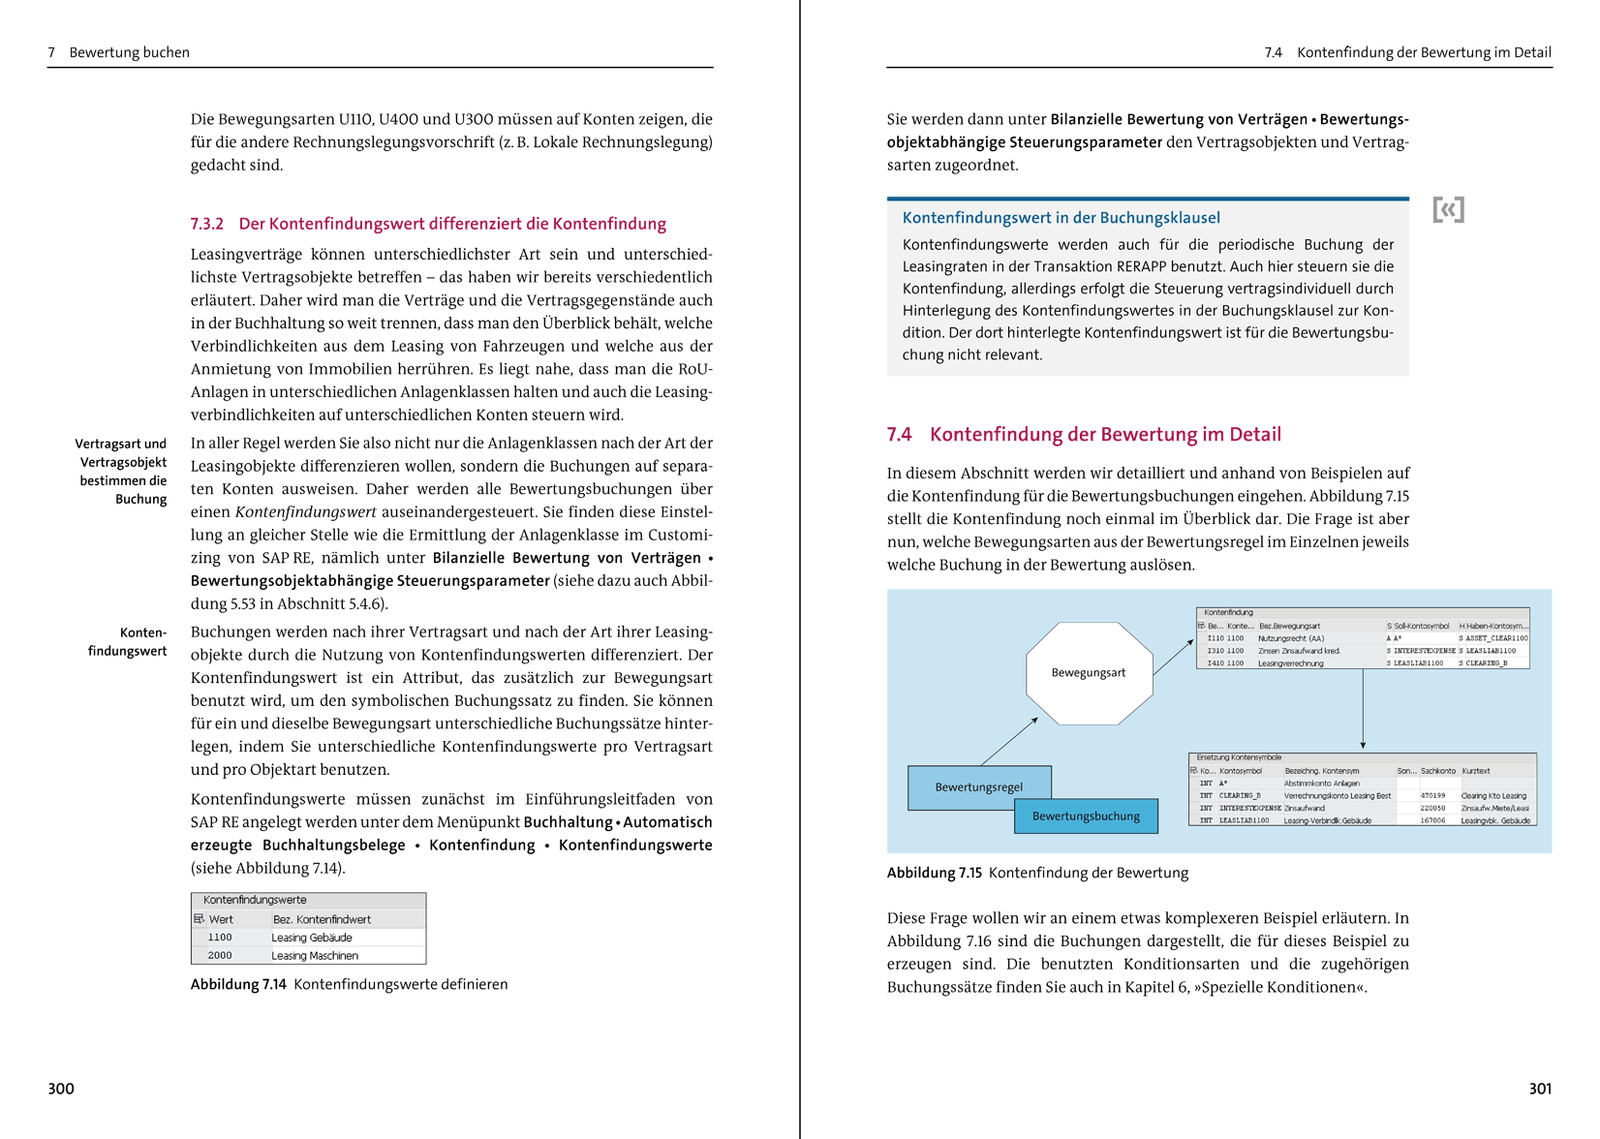 IFRS 16 – Leasingbilanzierung mit SAP (SAP PRESS)